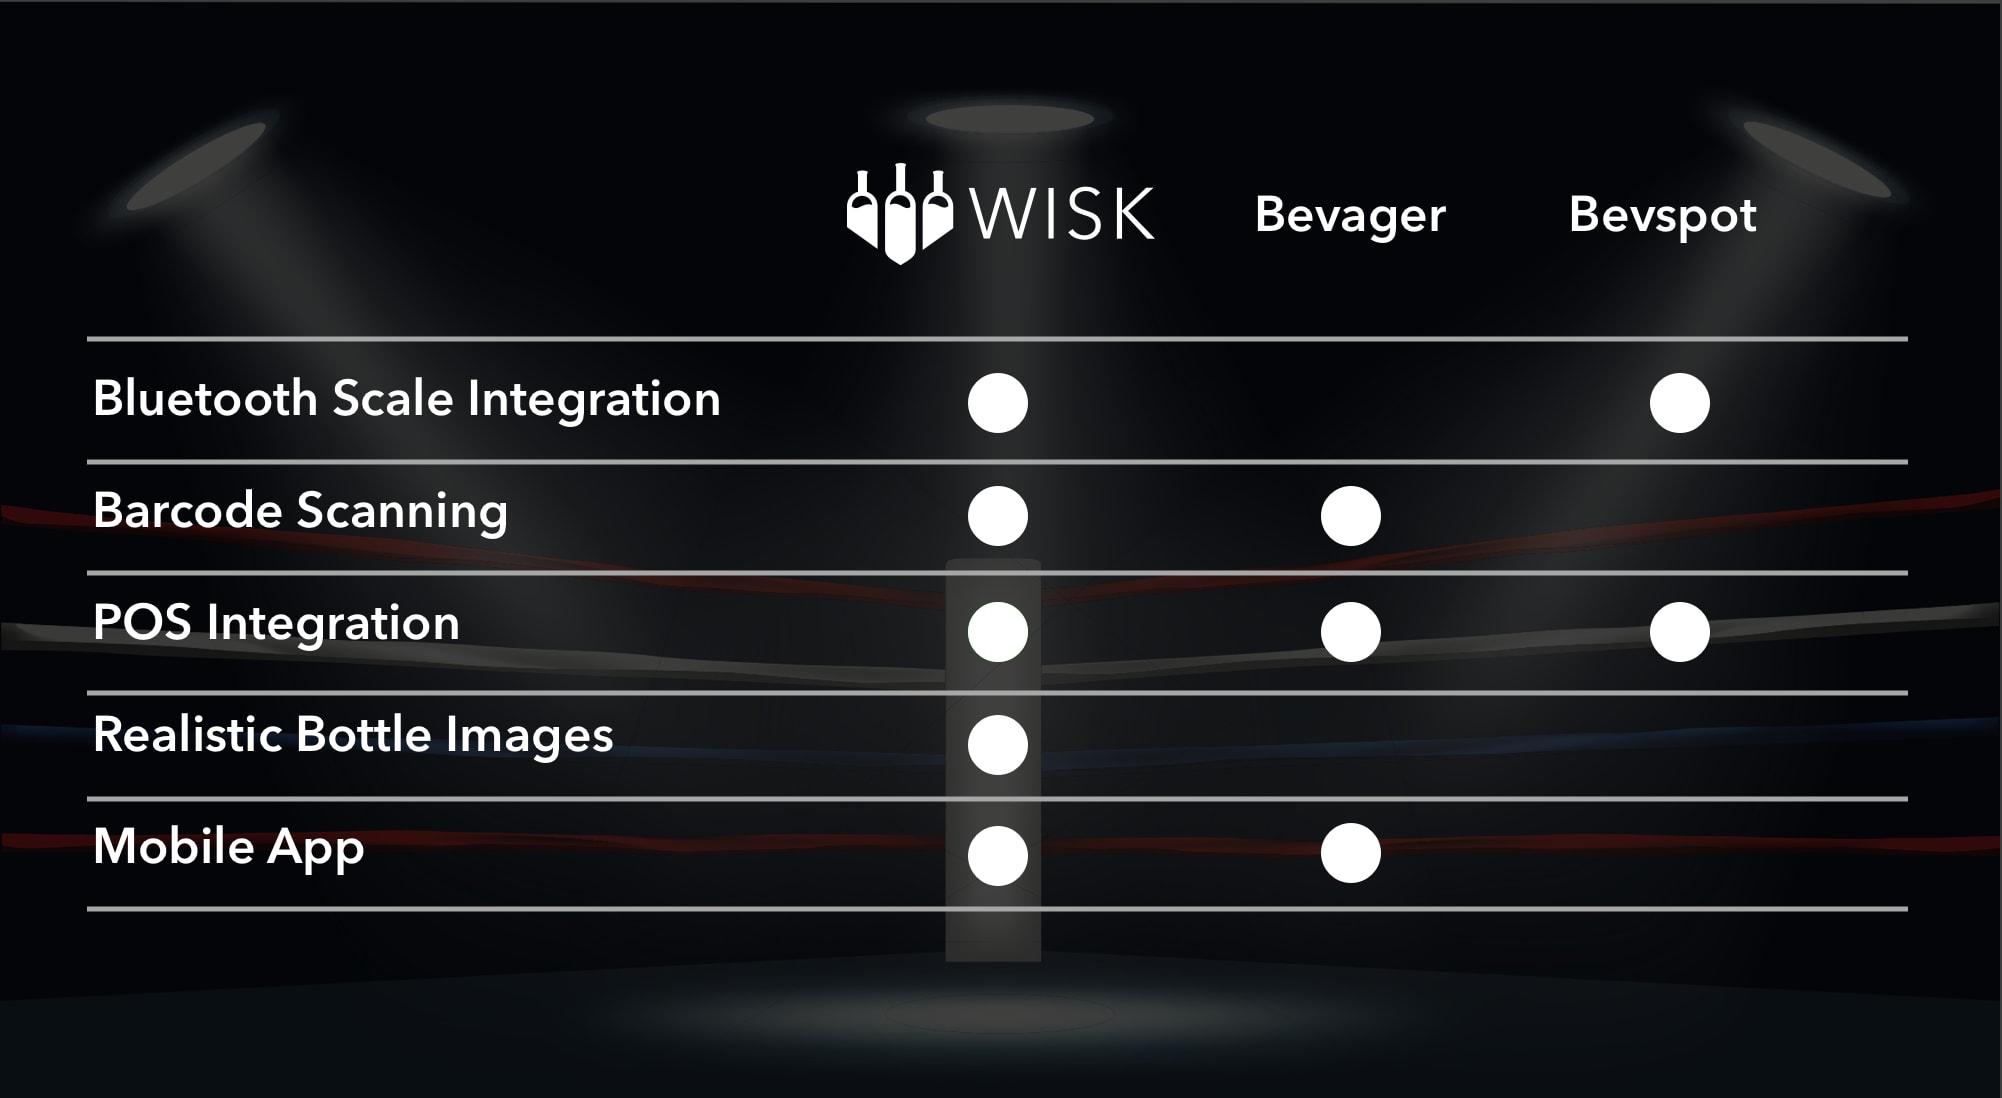 chart, comparison, bevager vs bevspot, wisk